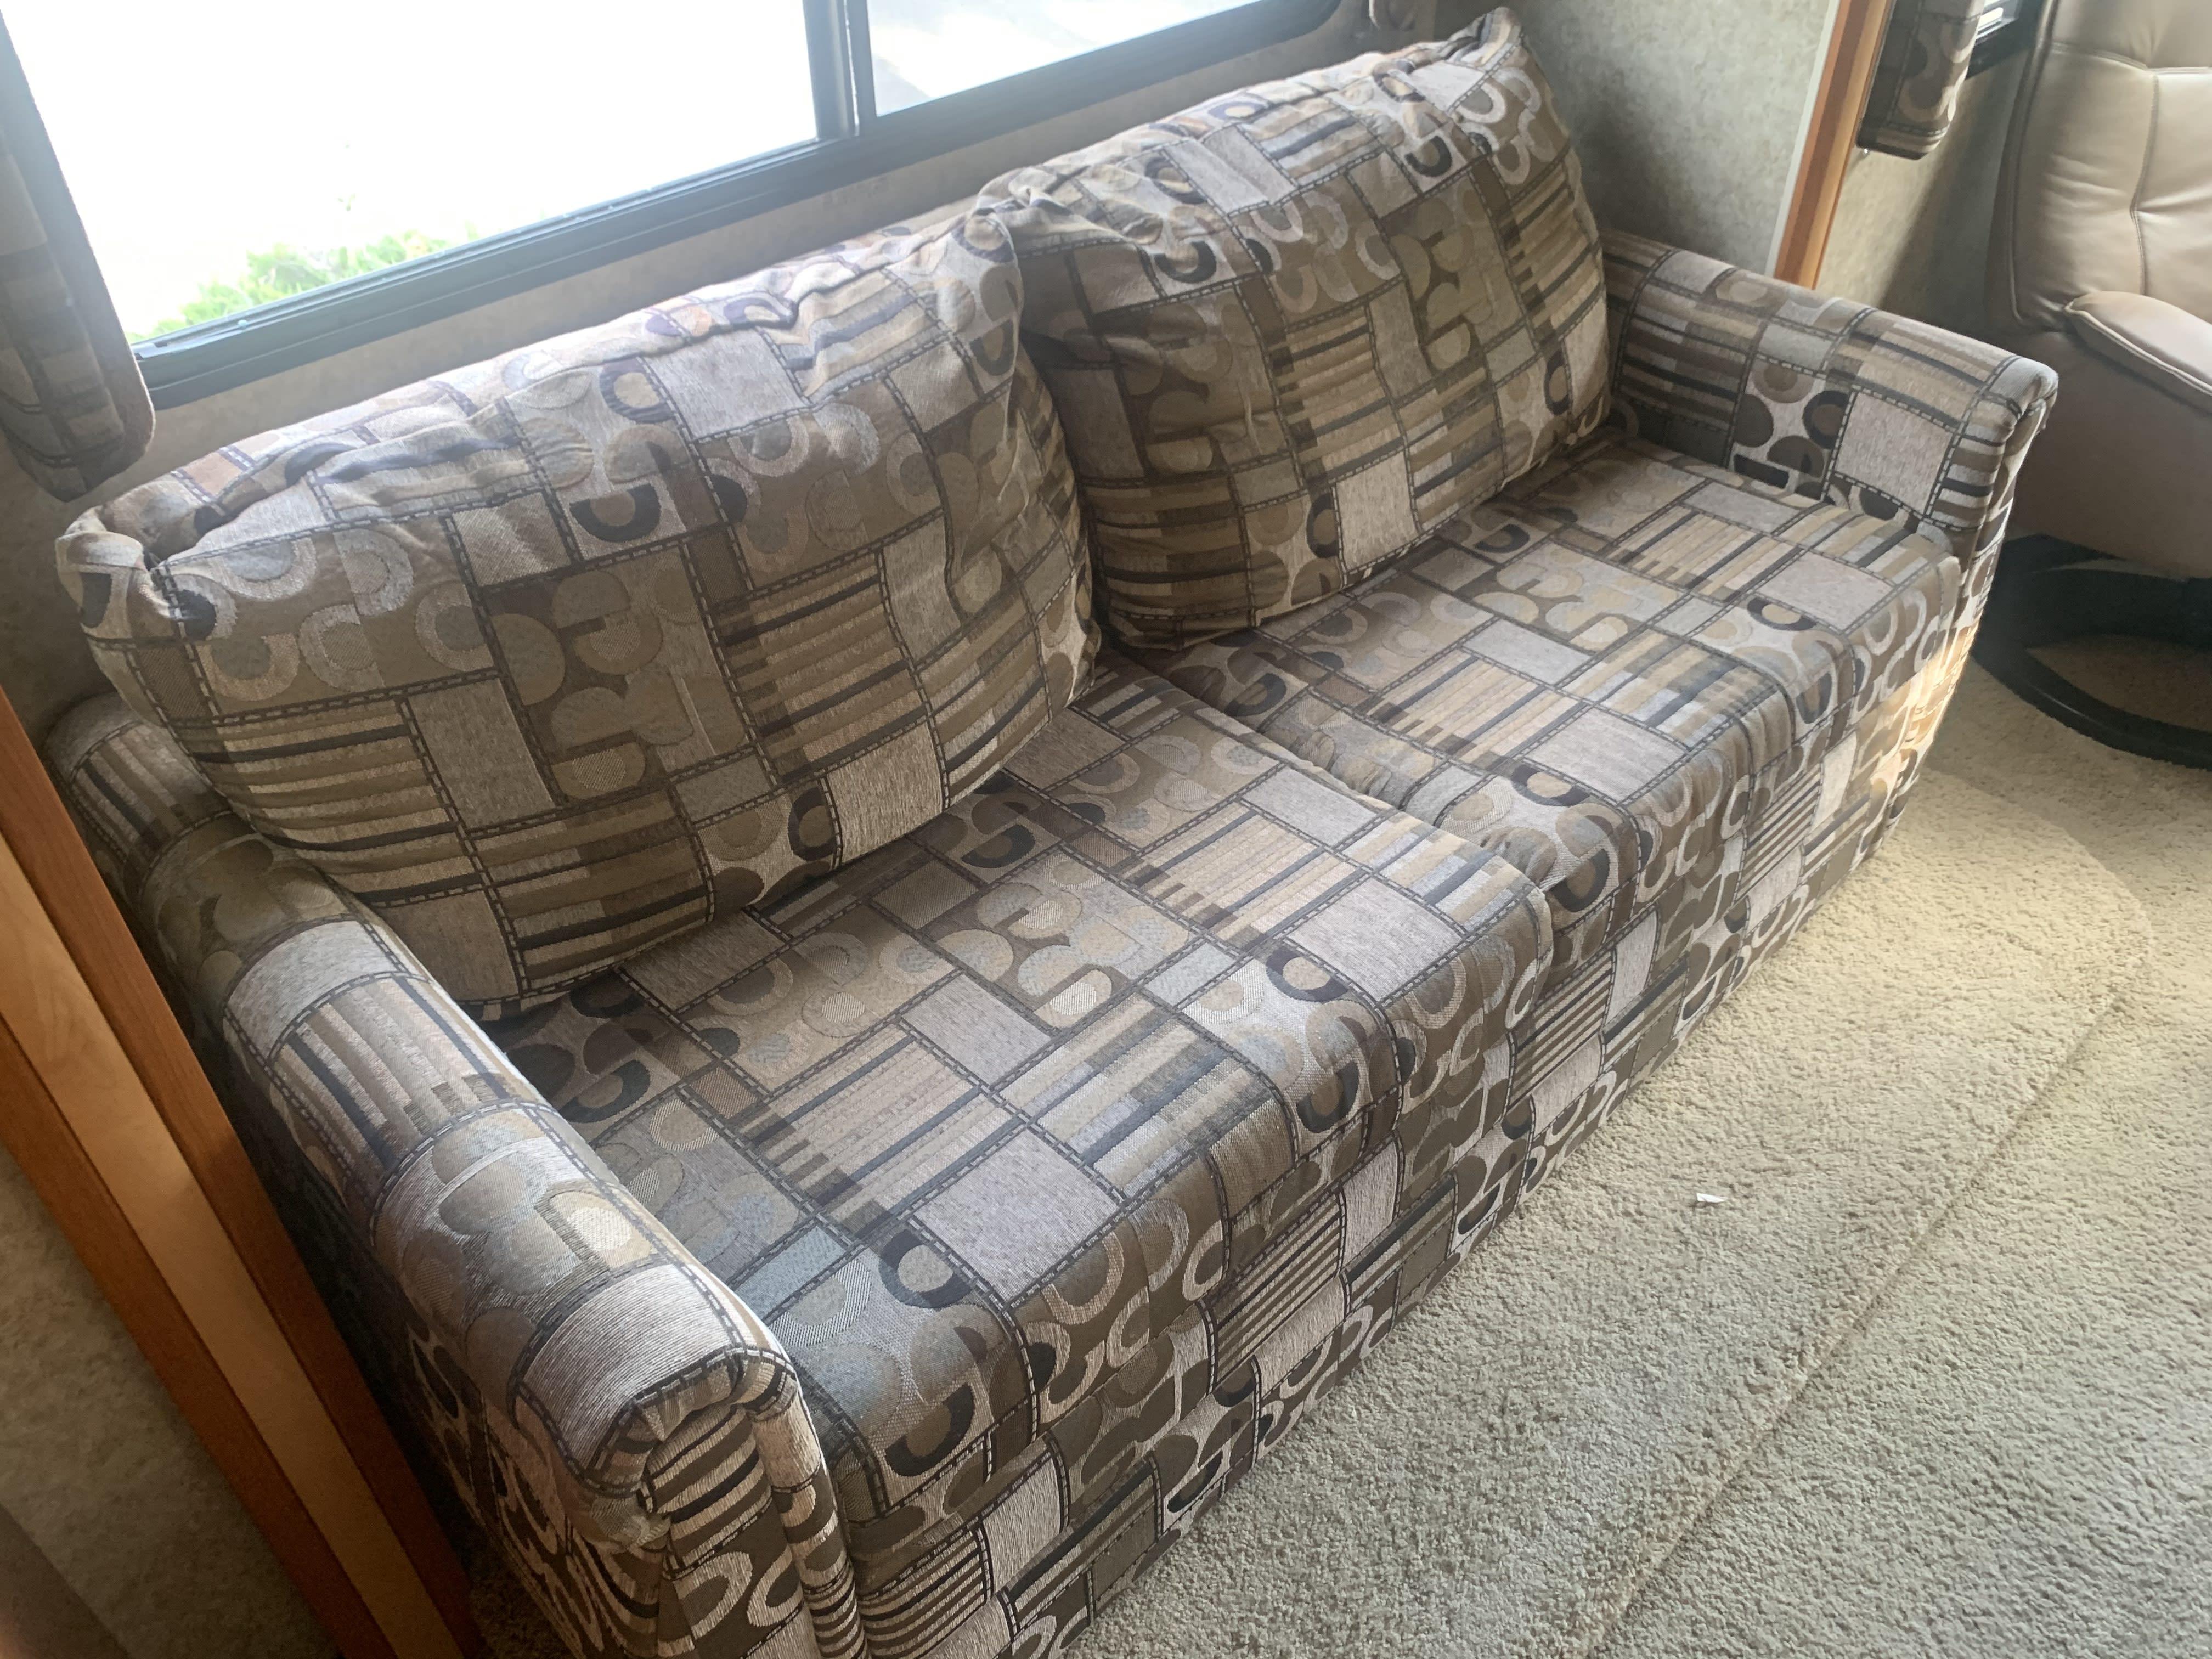 Sleeper couch. Winnebago Outlook 2009